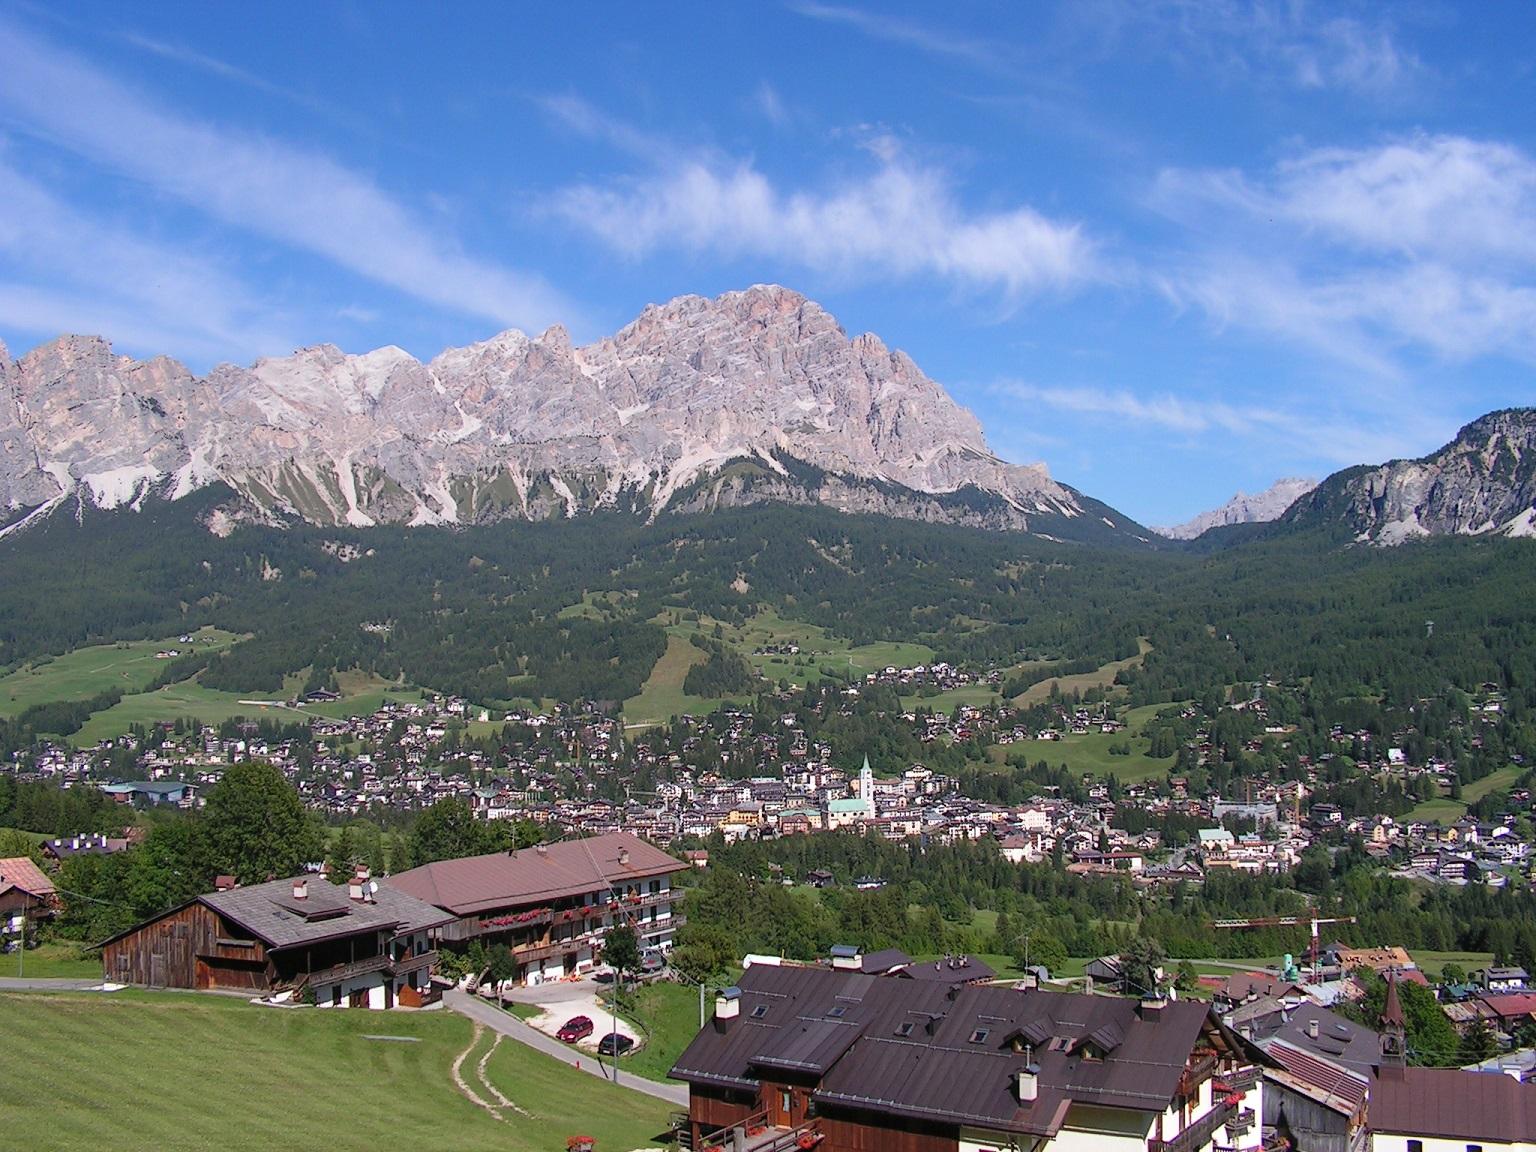 Imagen aérea de Cortina d'Ampezzo (WIKIPEDIA).